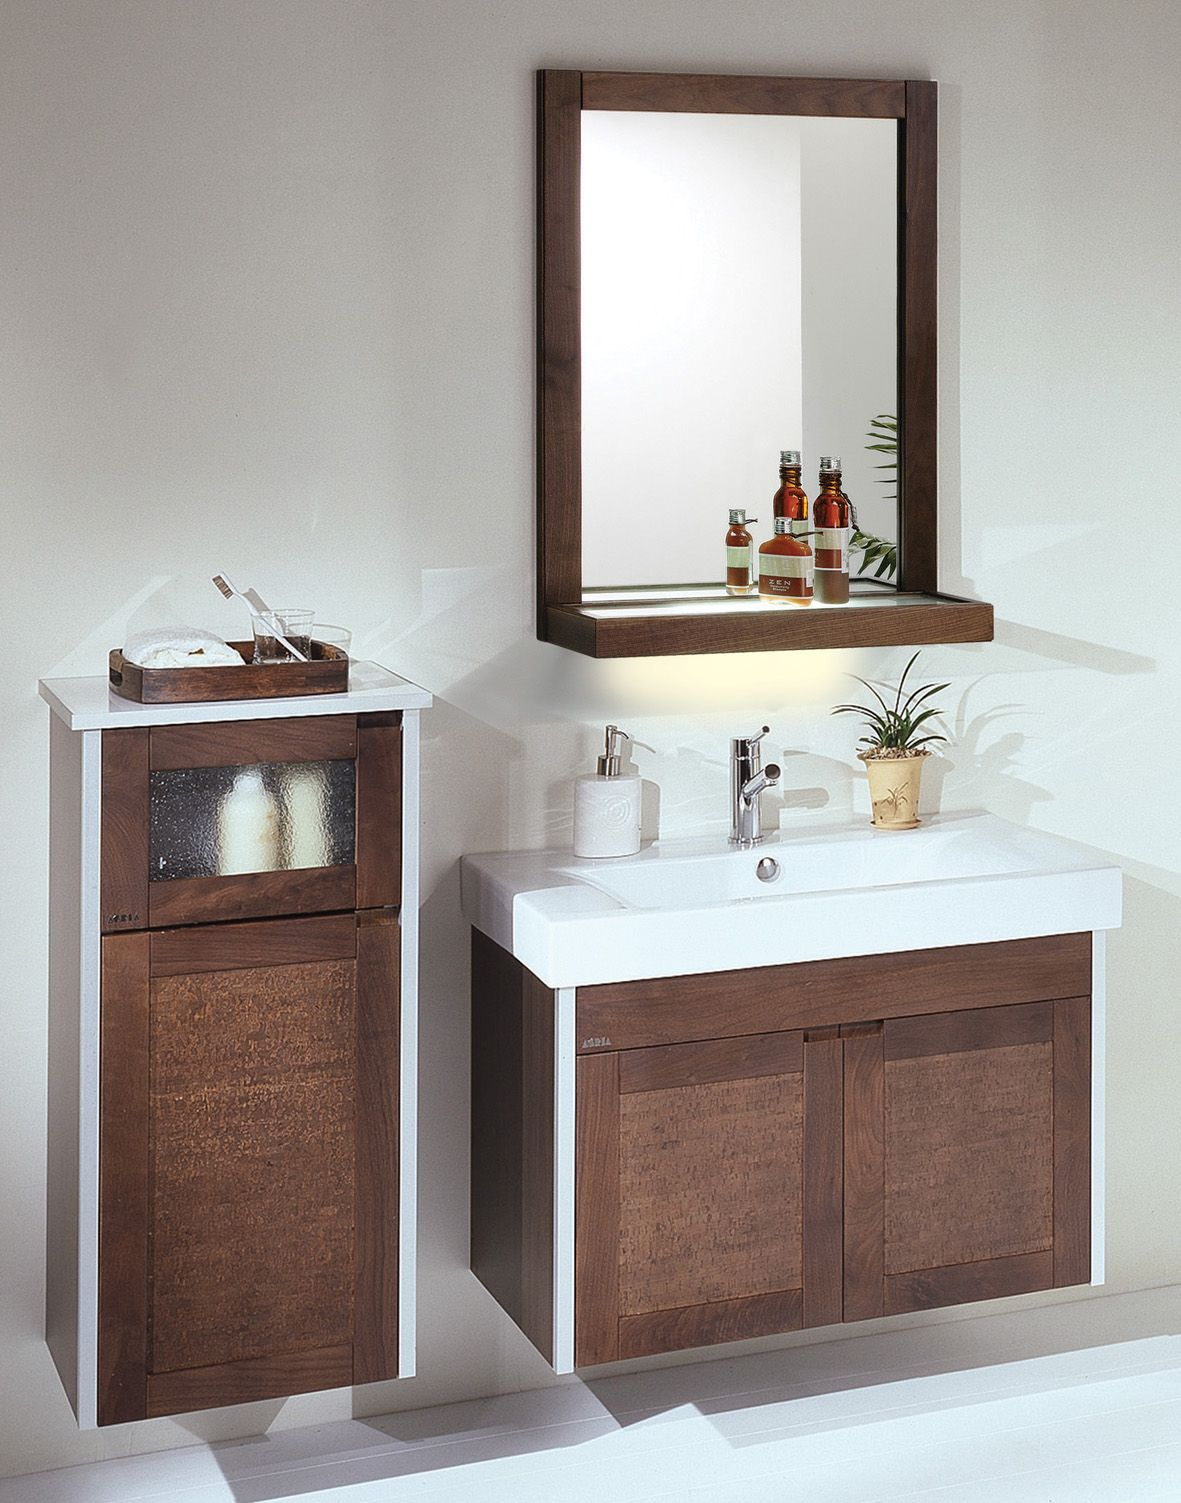 Small 2 Sink Vanity. Photos  Bathroom Sink With Fish Tank Vanity bathroom porcelain ceramic vessel vanity sink art basin vanities cabinets white Stribal com Design Interior Home